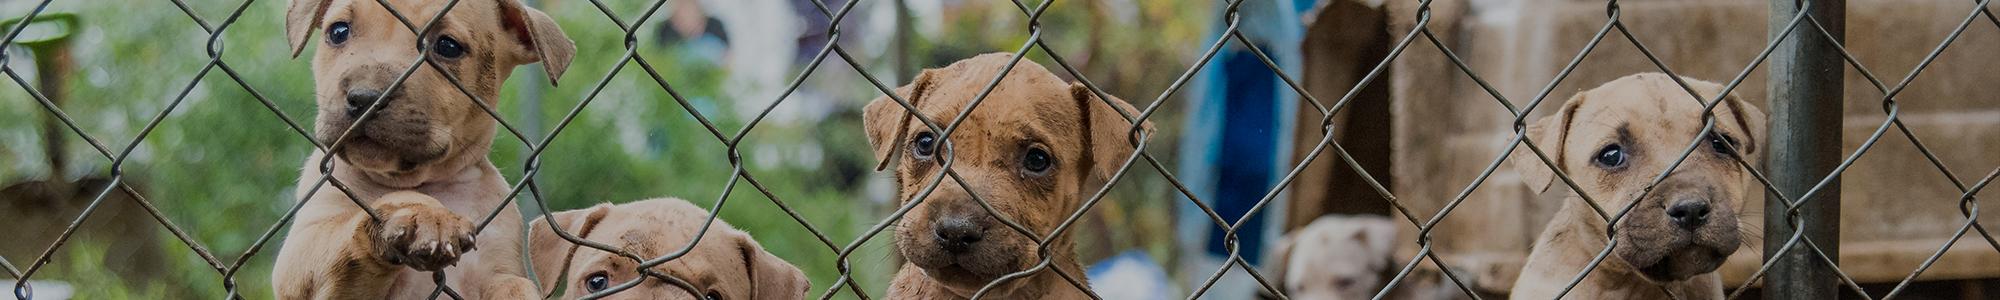 help the aspca put a stop to animal cruelty